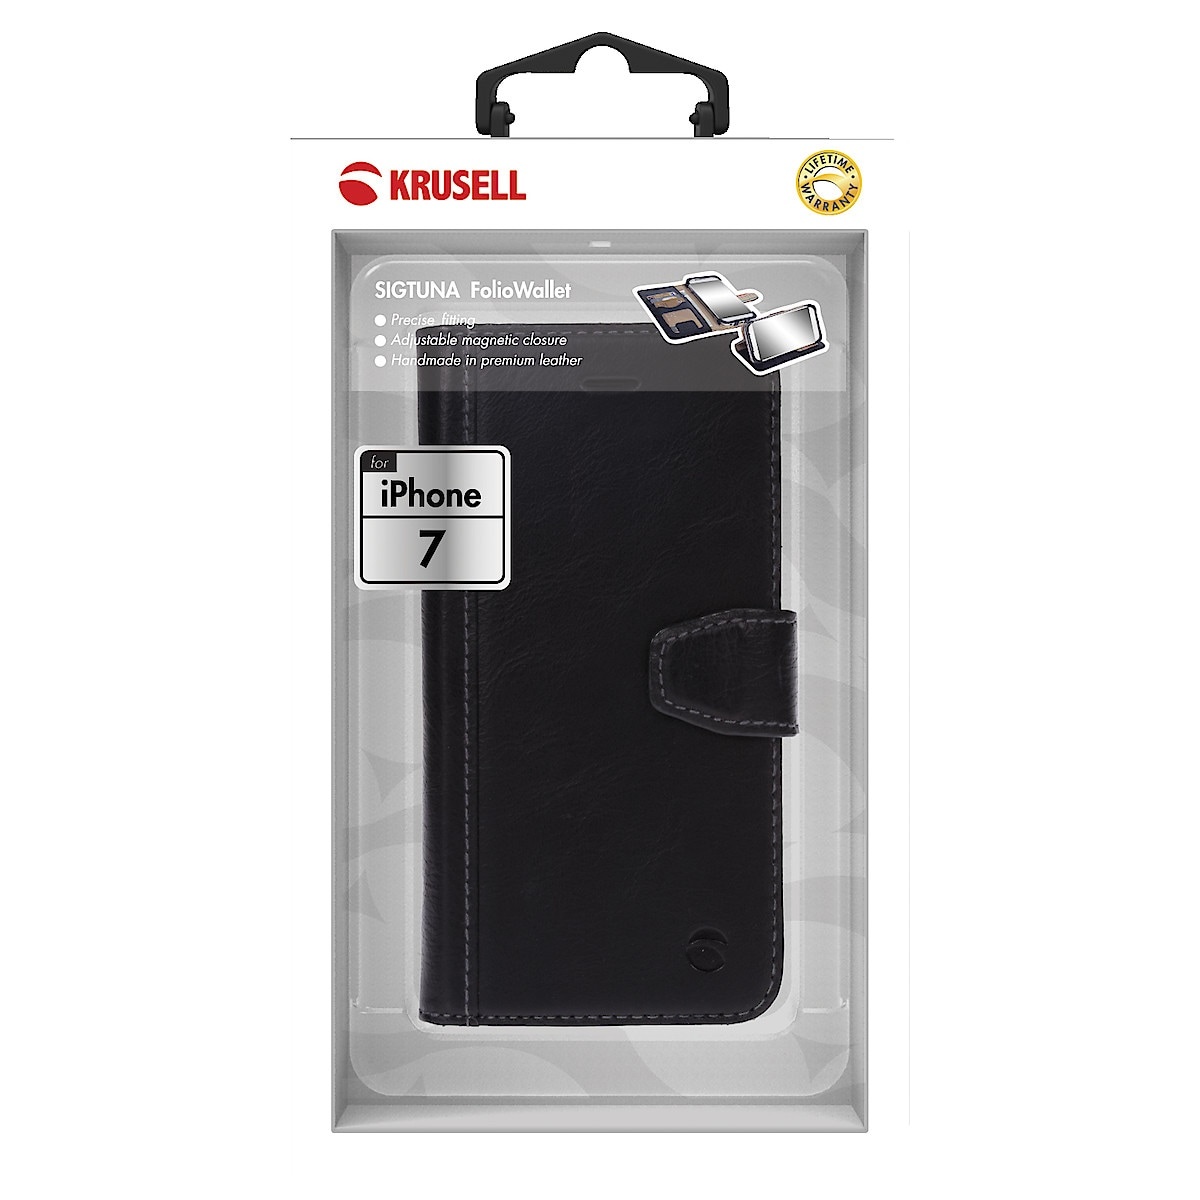 Lompakkokotelo iPhone 6/6S/7/8, Krusell Sigtuna FolioWallet